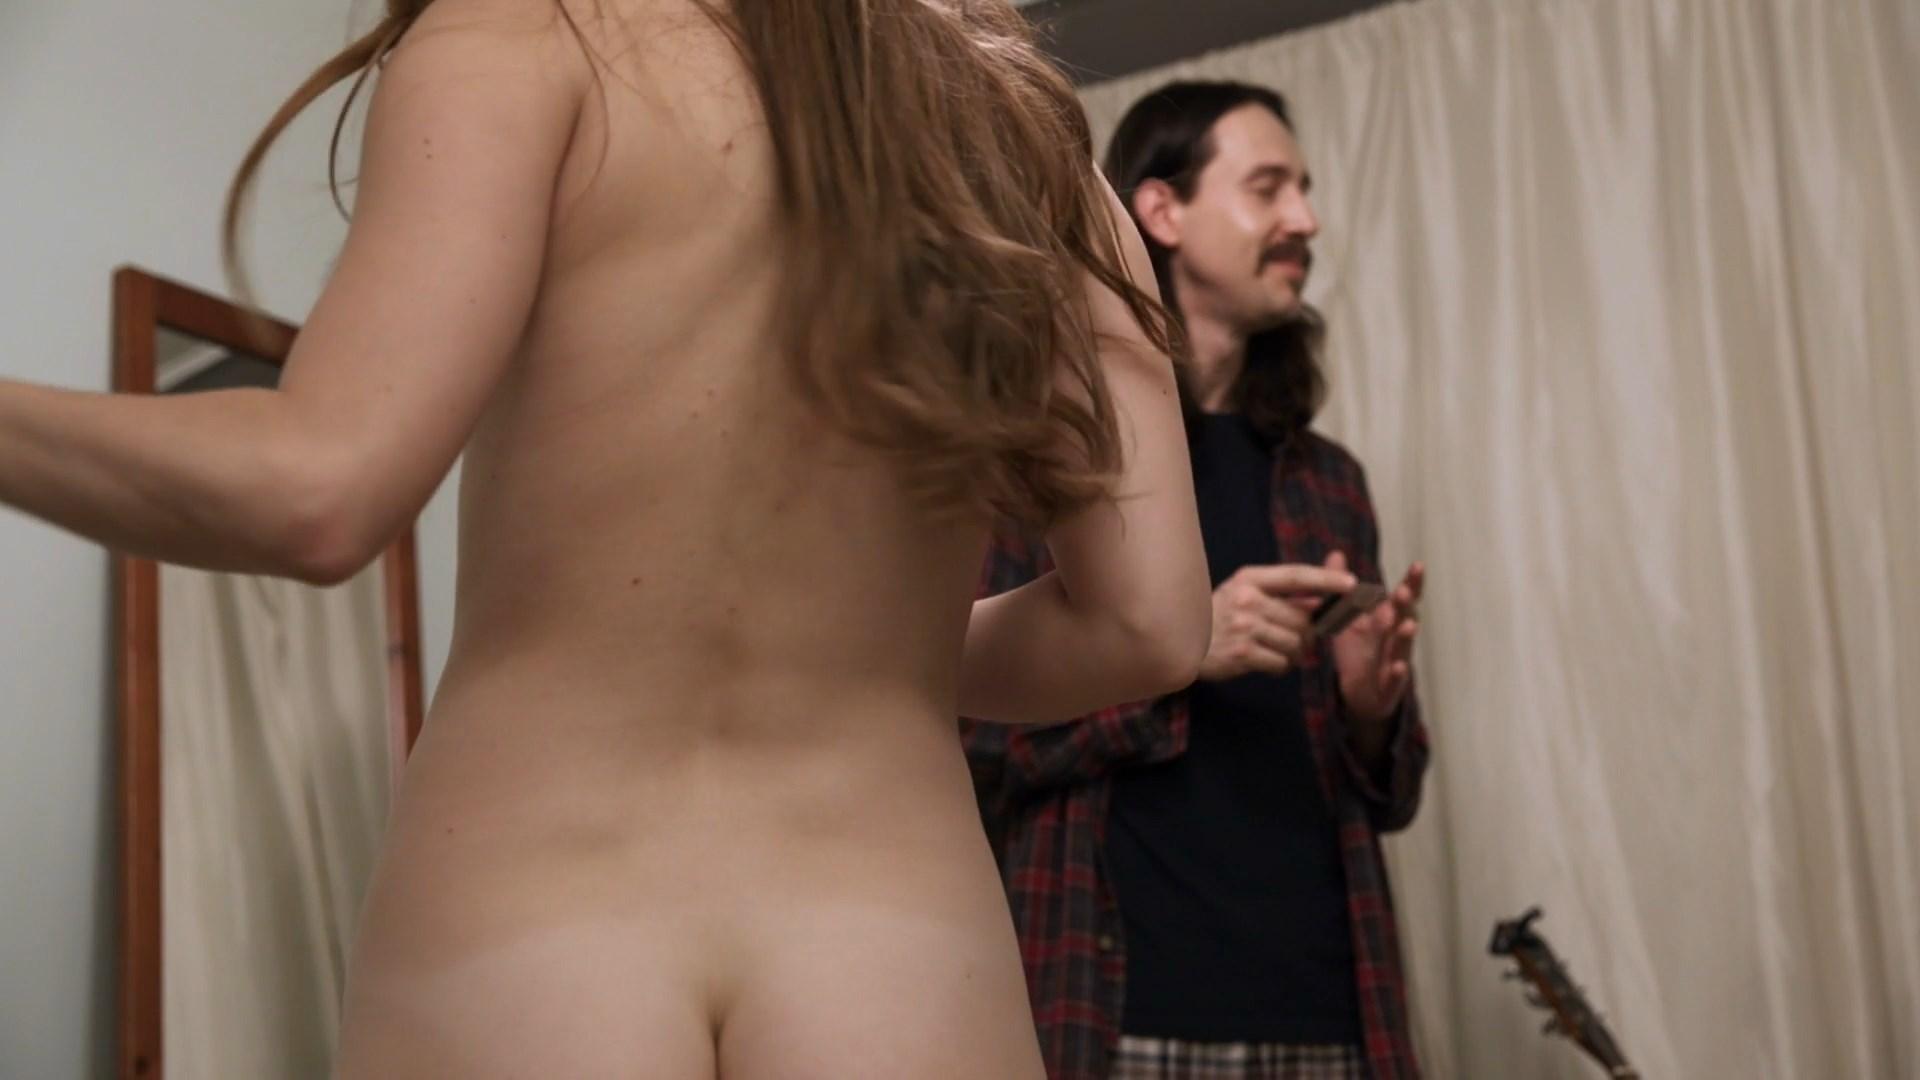 Angélica Blandon Nude hd video » page 160 » nudecelebvideo - your box of nude